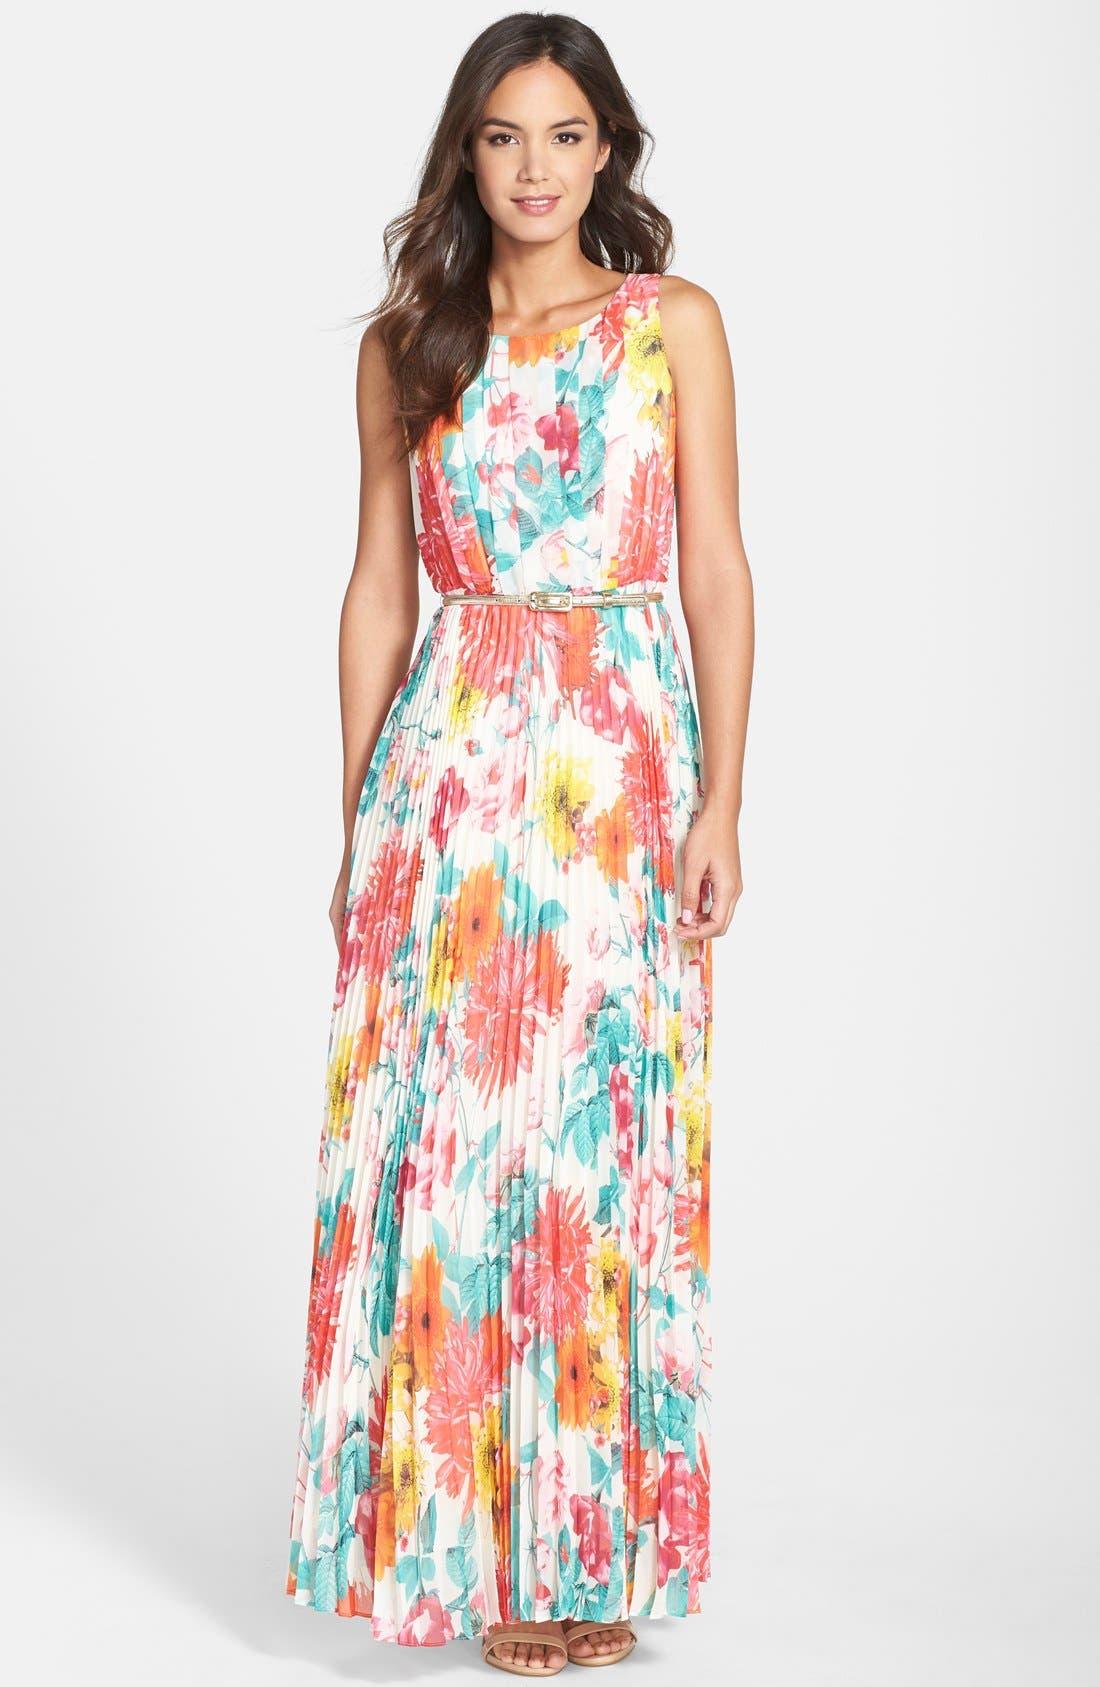 Alternate Image 1 Selected - Eliza J Belted Floral Print Chiffon Maxi Dress (Regular & Petite)